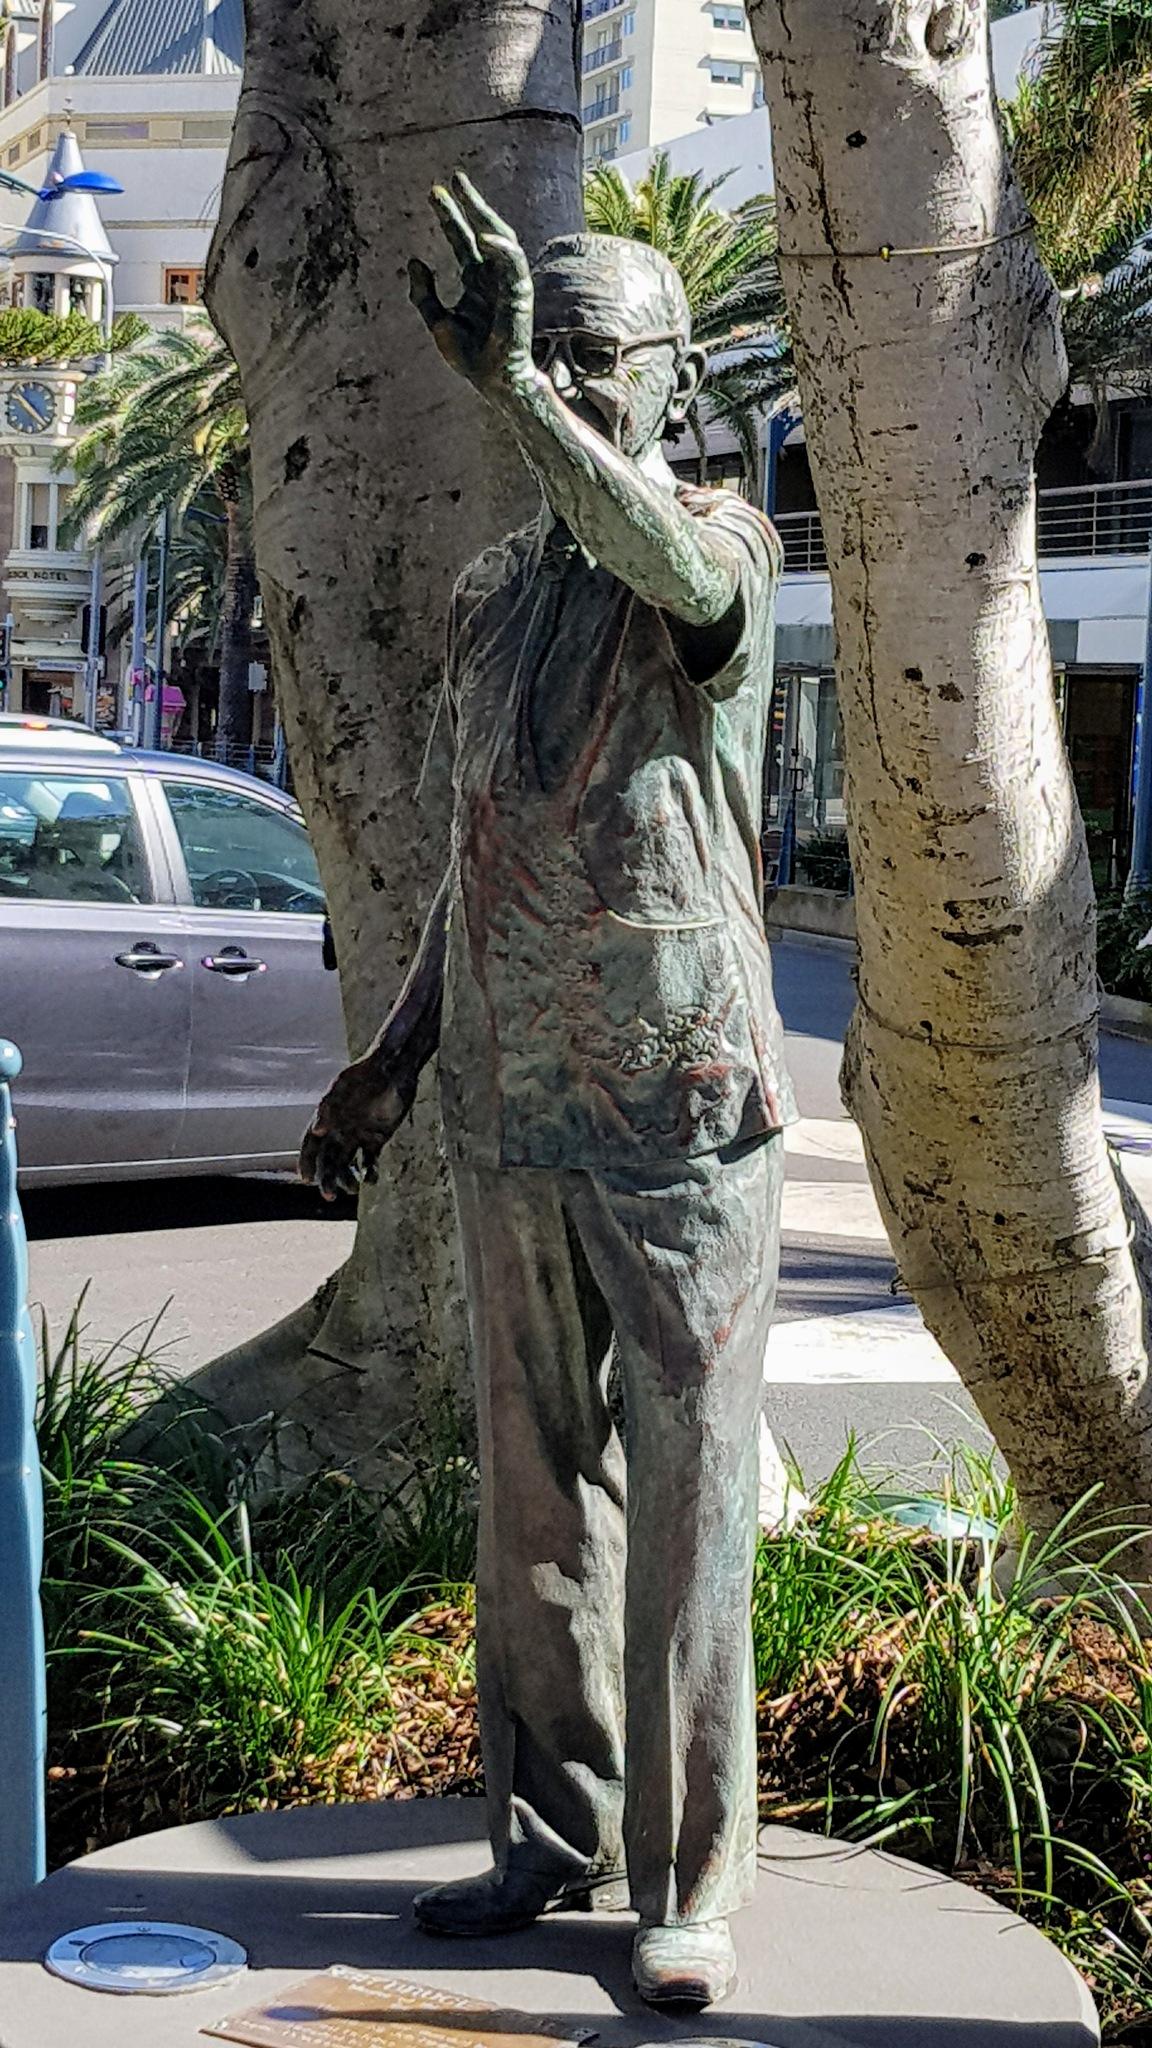 Old man waving by Michael De St Pern